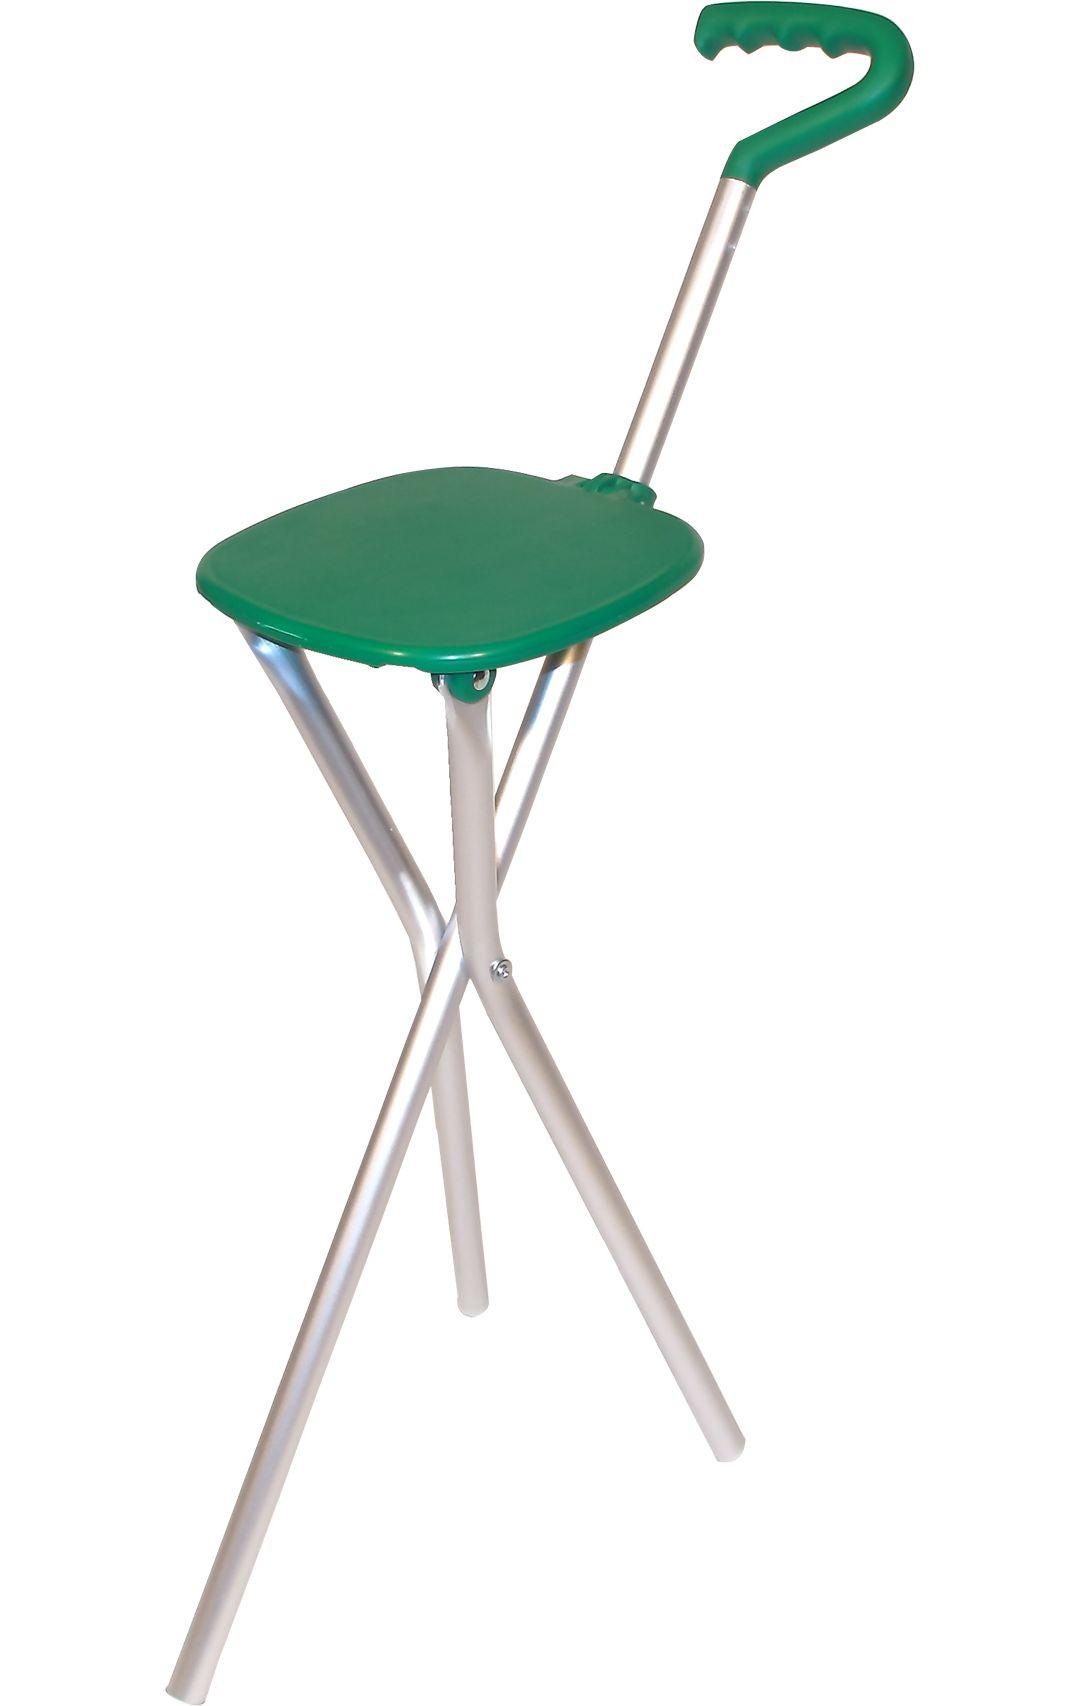 Brilliant Sport Seat Folding Seat Walking Stick Pabps2019 Chair Design Images Pabps2019Com